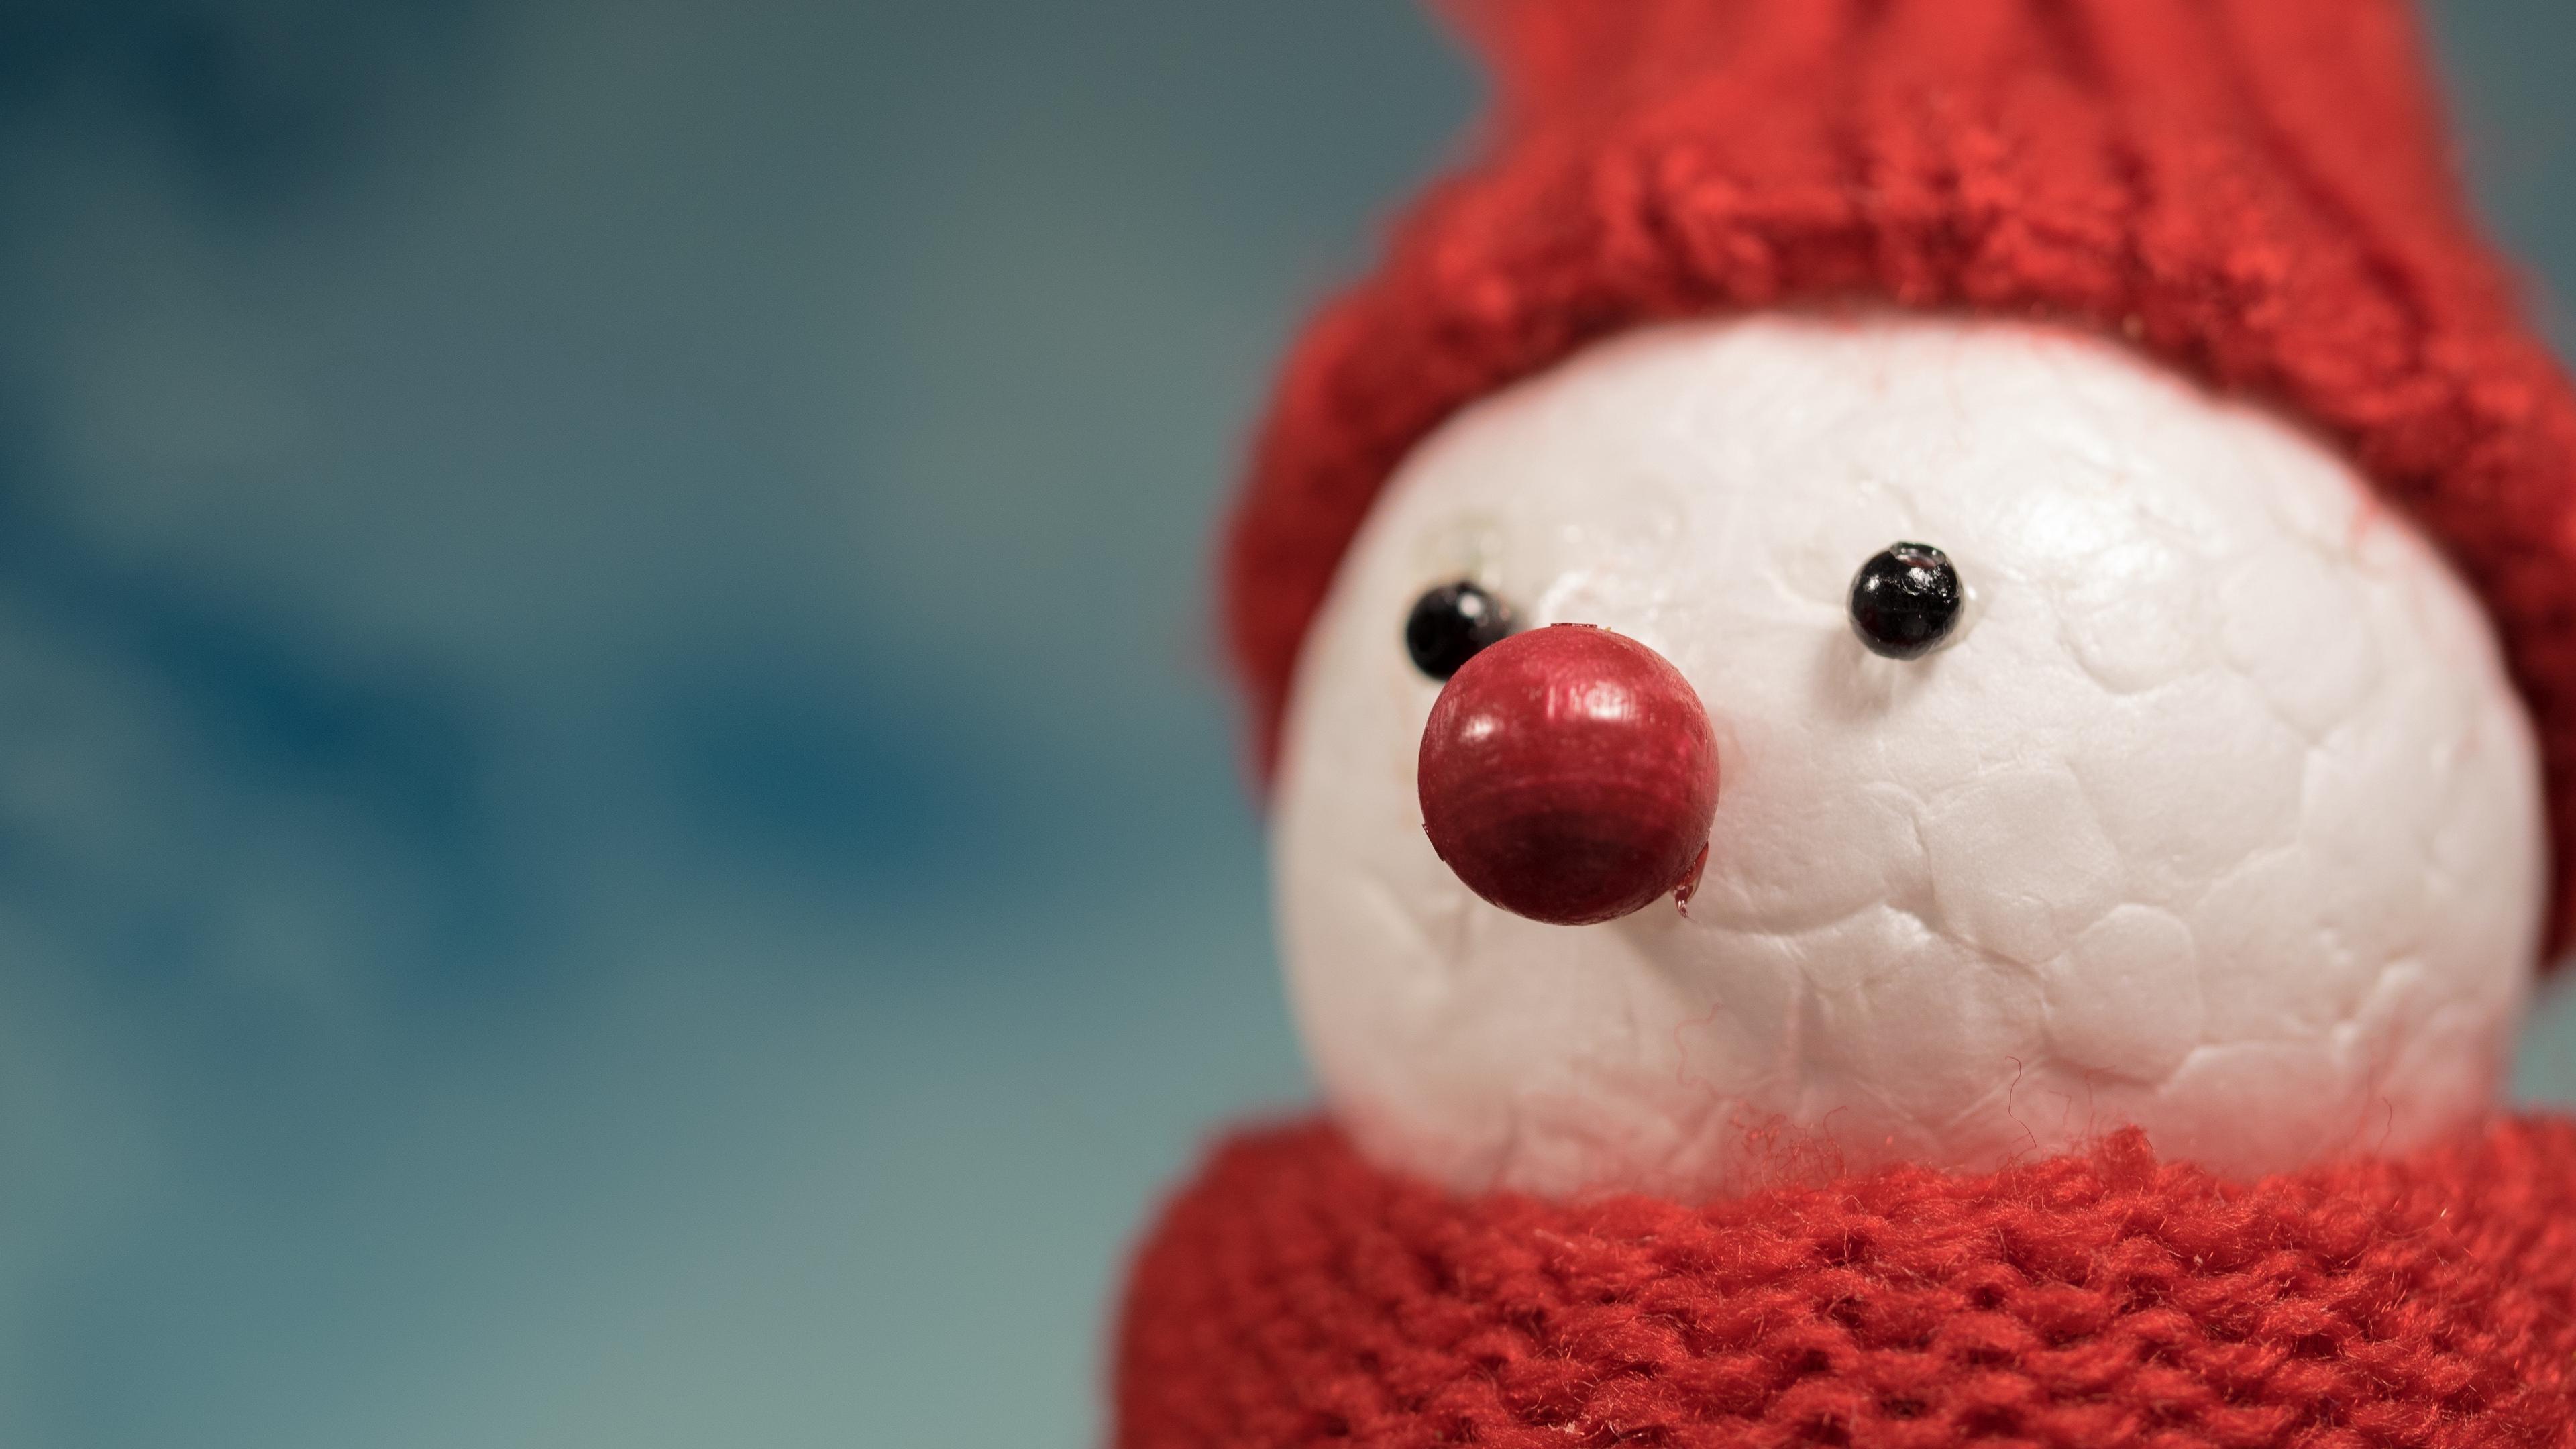 snowman hat figure scarf 4k 1538344527 - snowman, hat, figure, scarf 4k - Snowman, hat, Figure